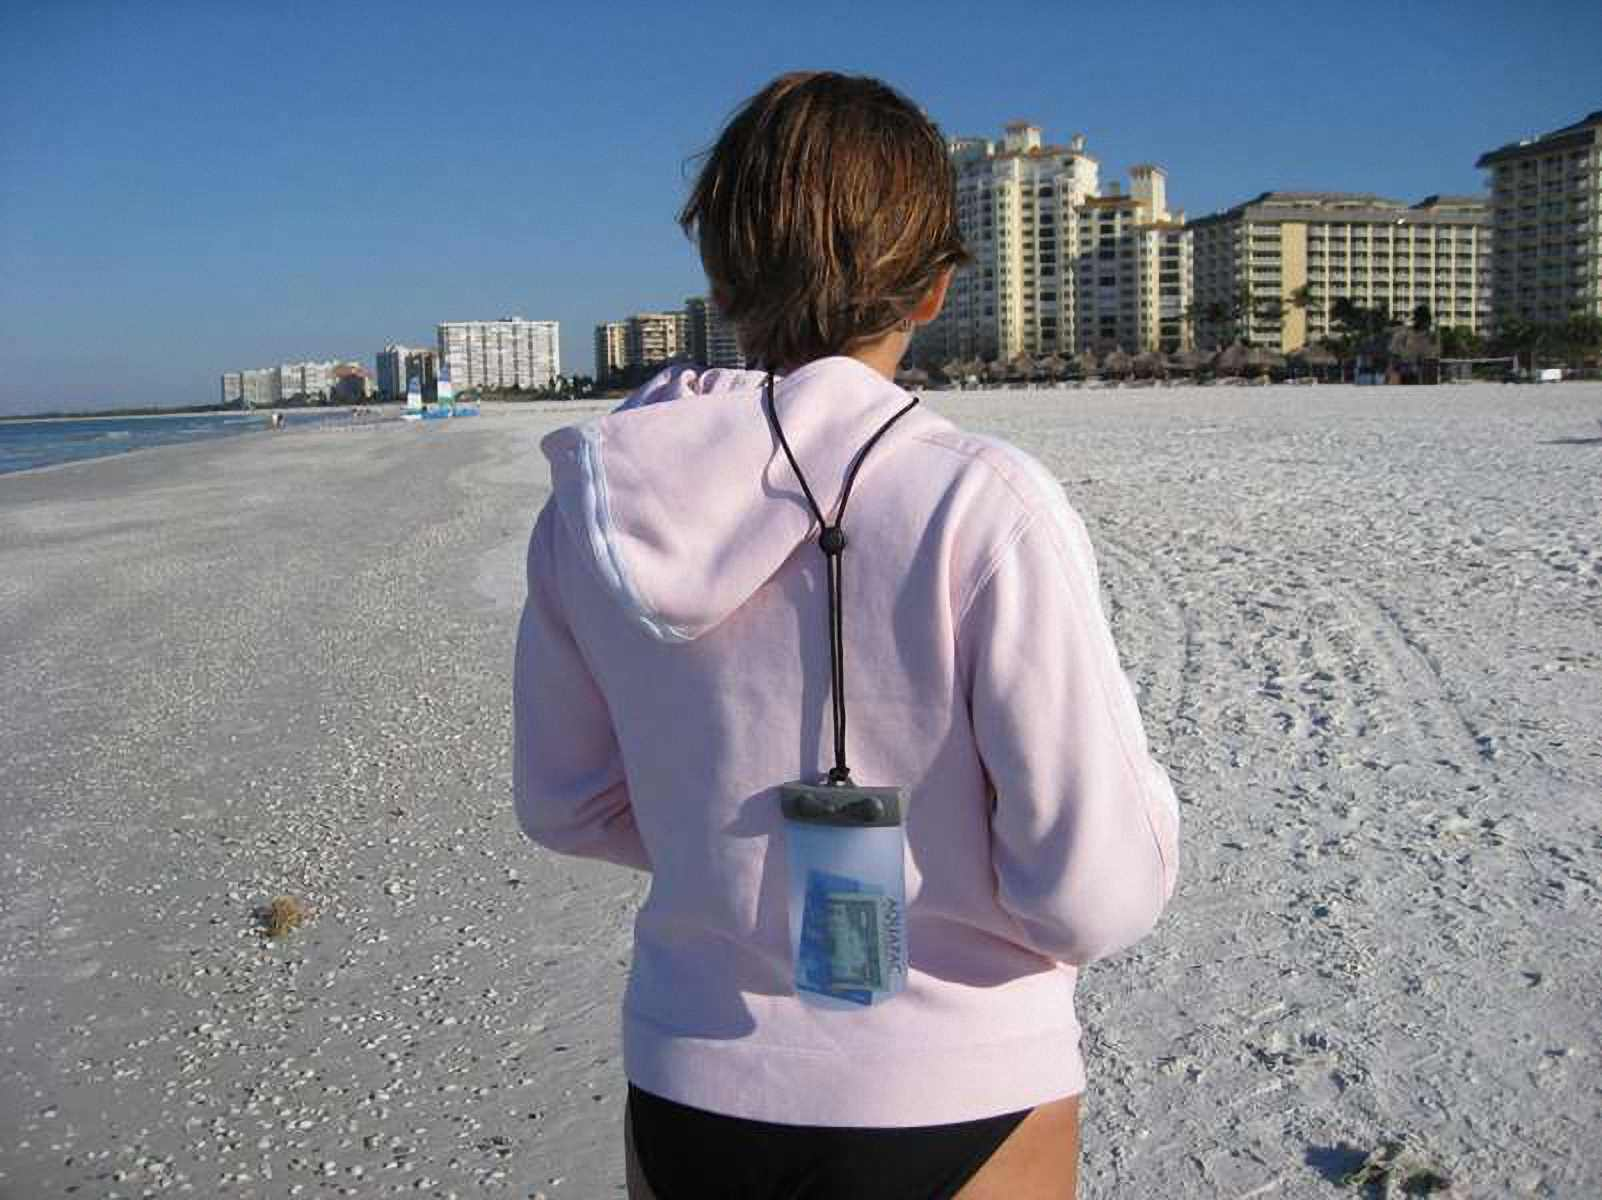 Водонепроницаемый чехол для документов - Aquapac 604. Aquapac - №1 в мире водонепроницаемых чехлов и сумок. Фото 4